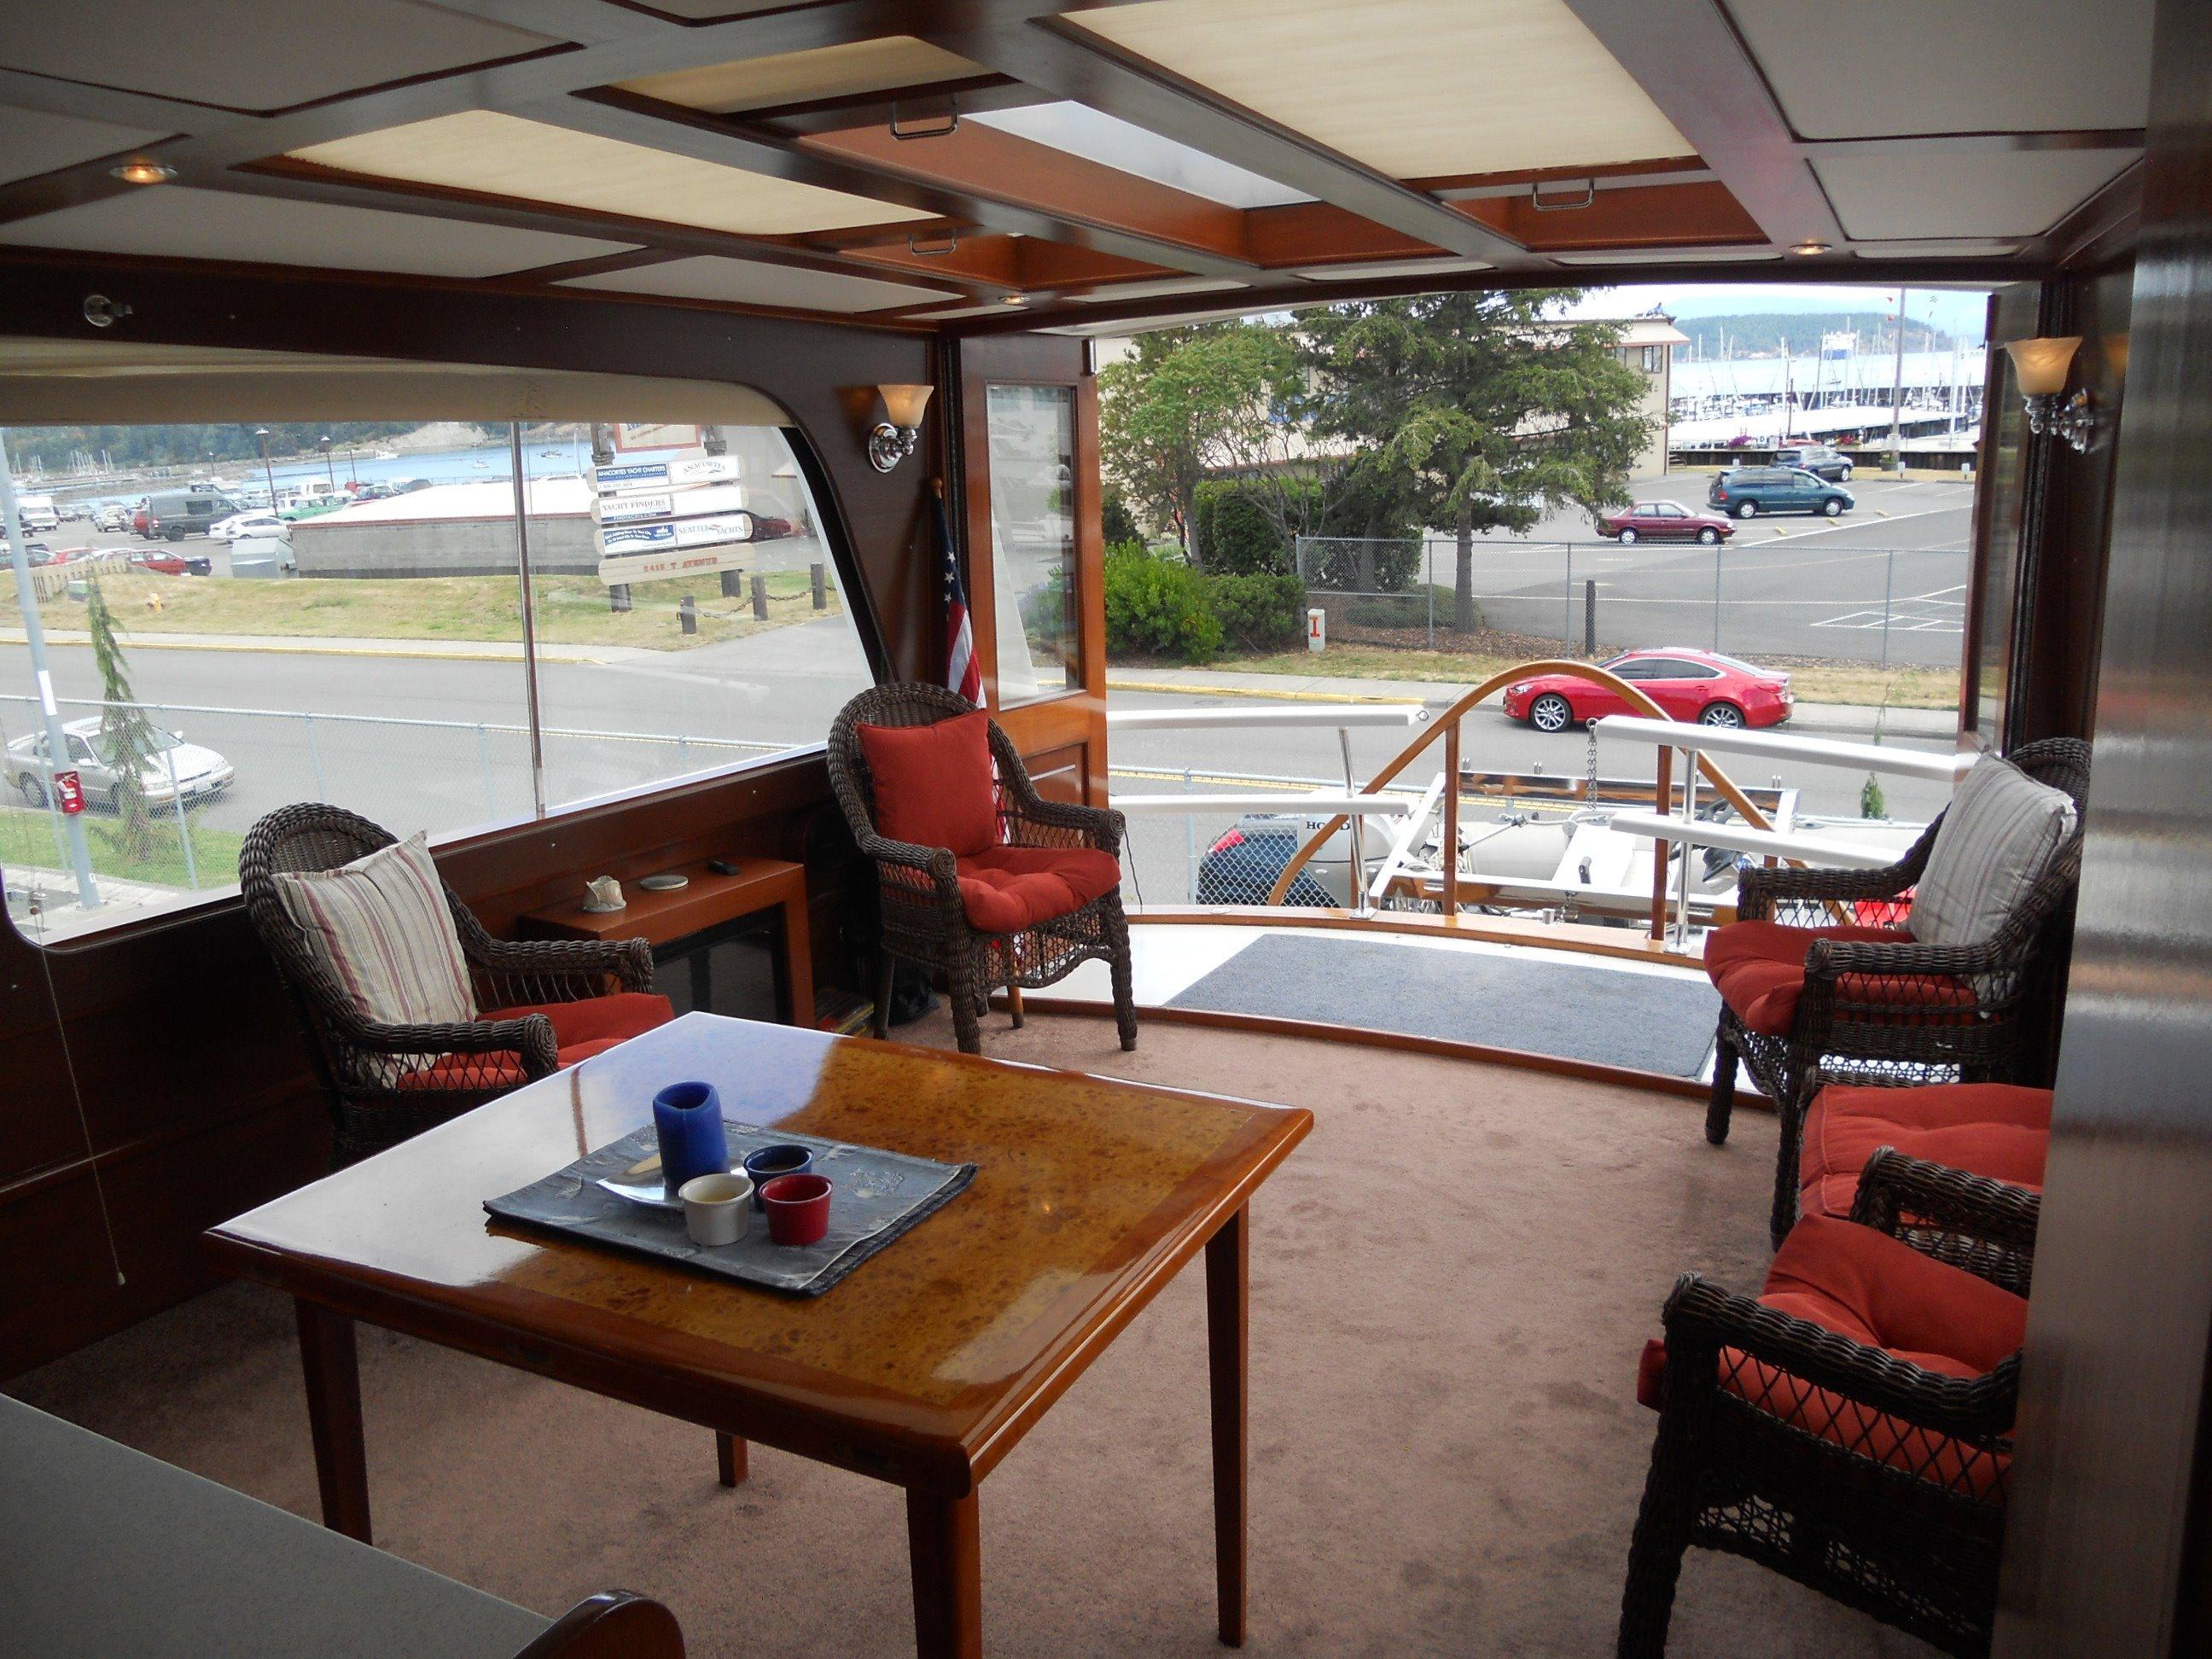 Salon aft to starboard